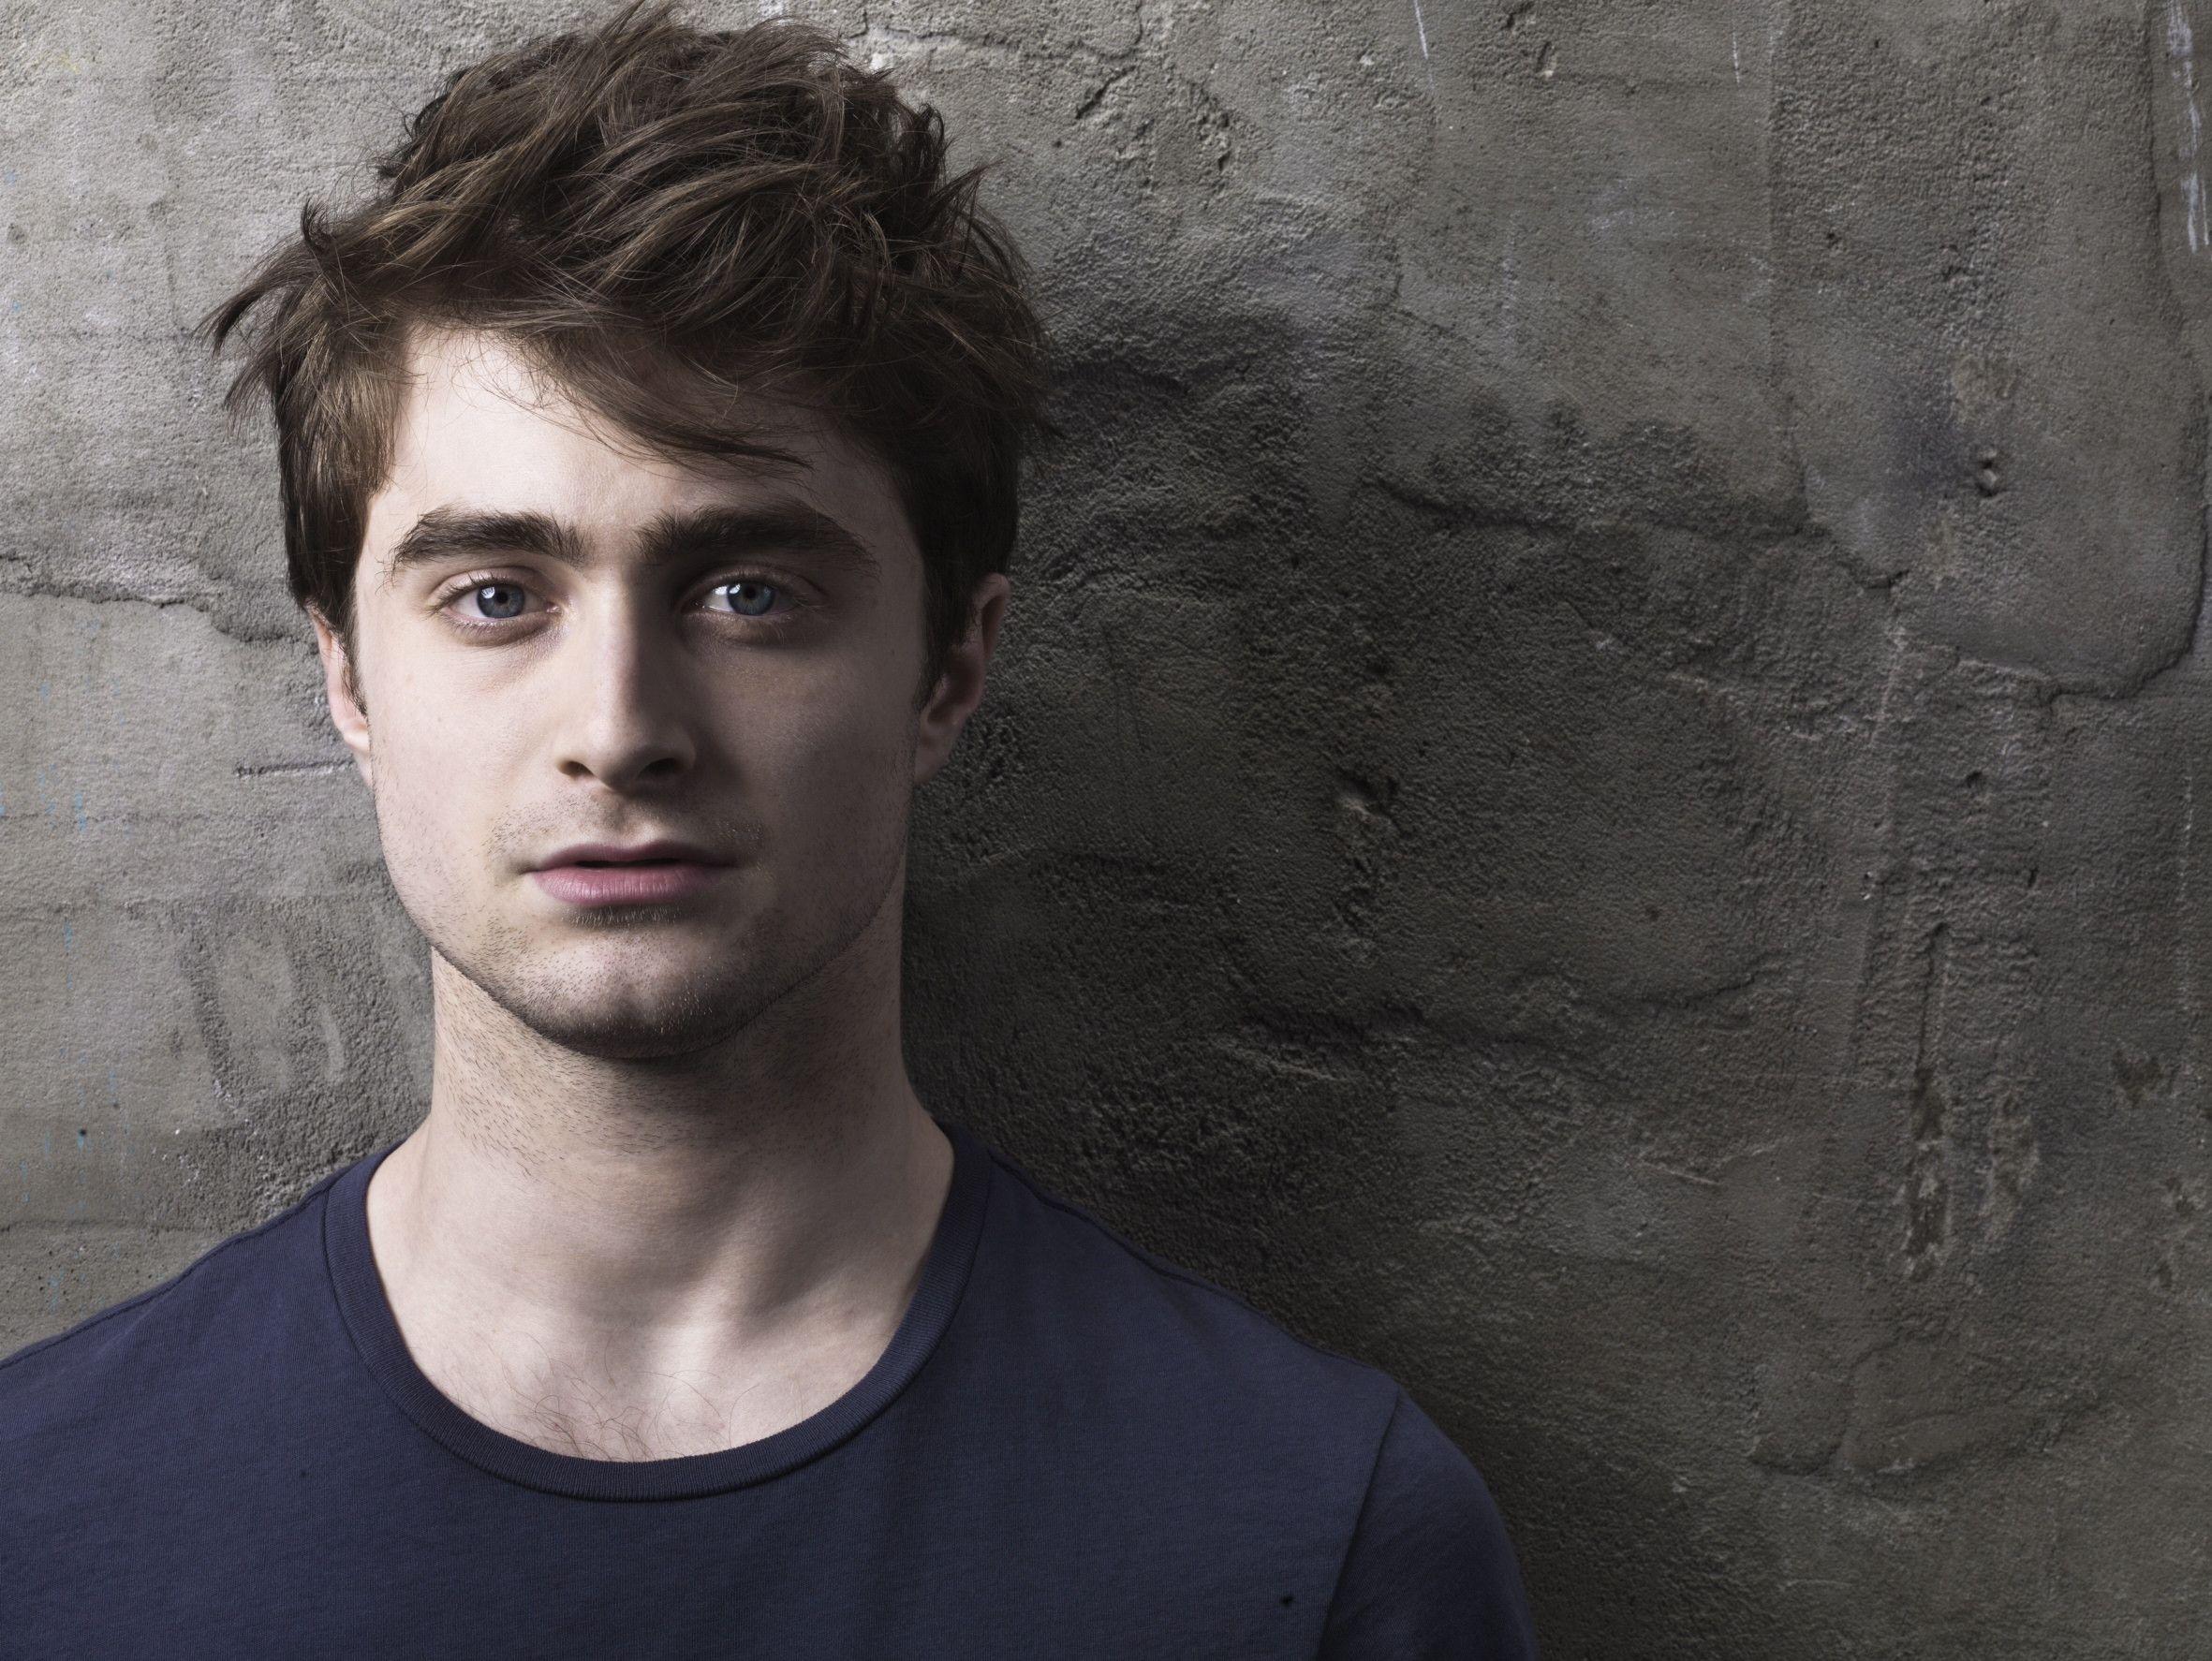 23 Hd Daniel Radcliffe Wallpapers-9988